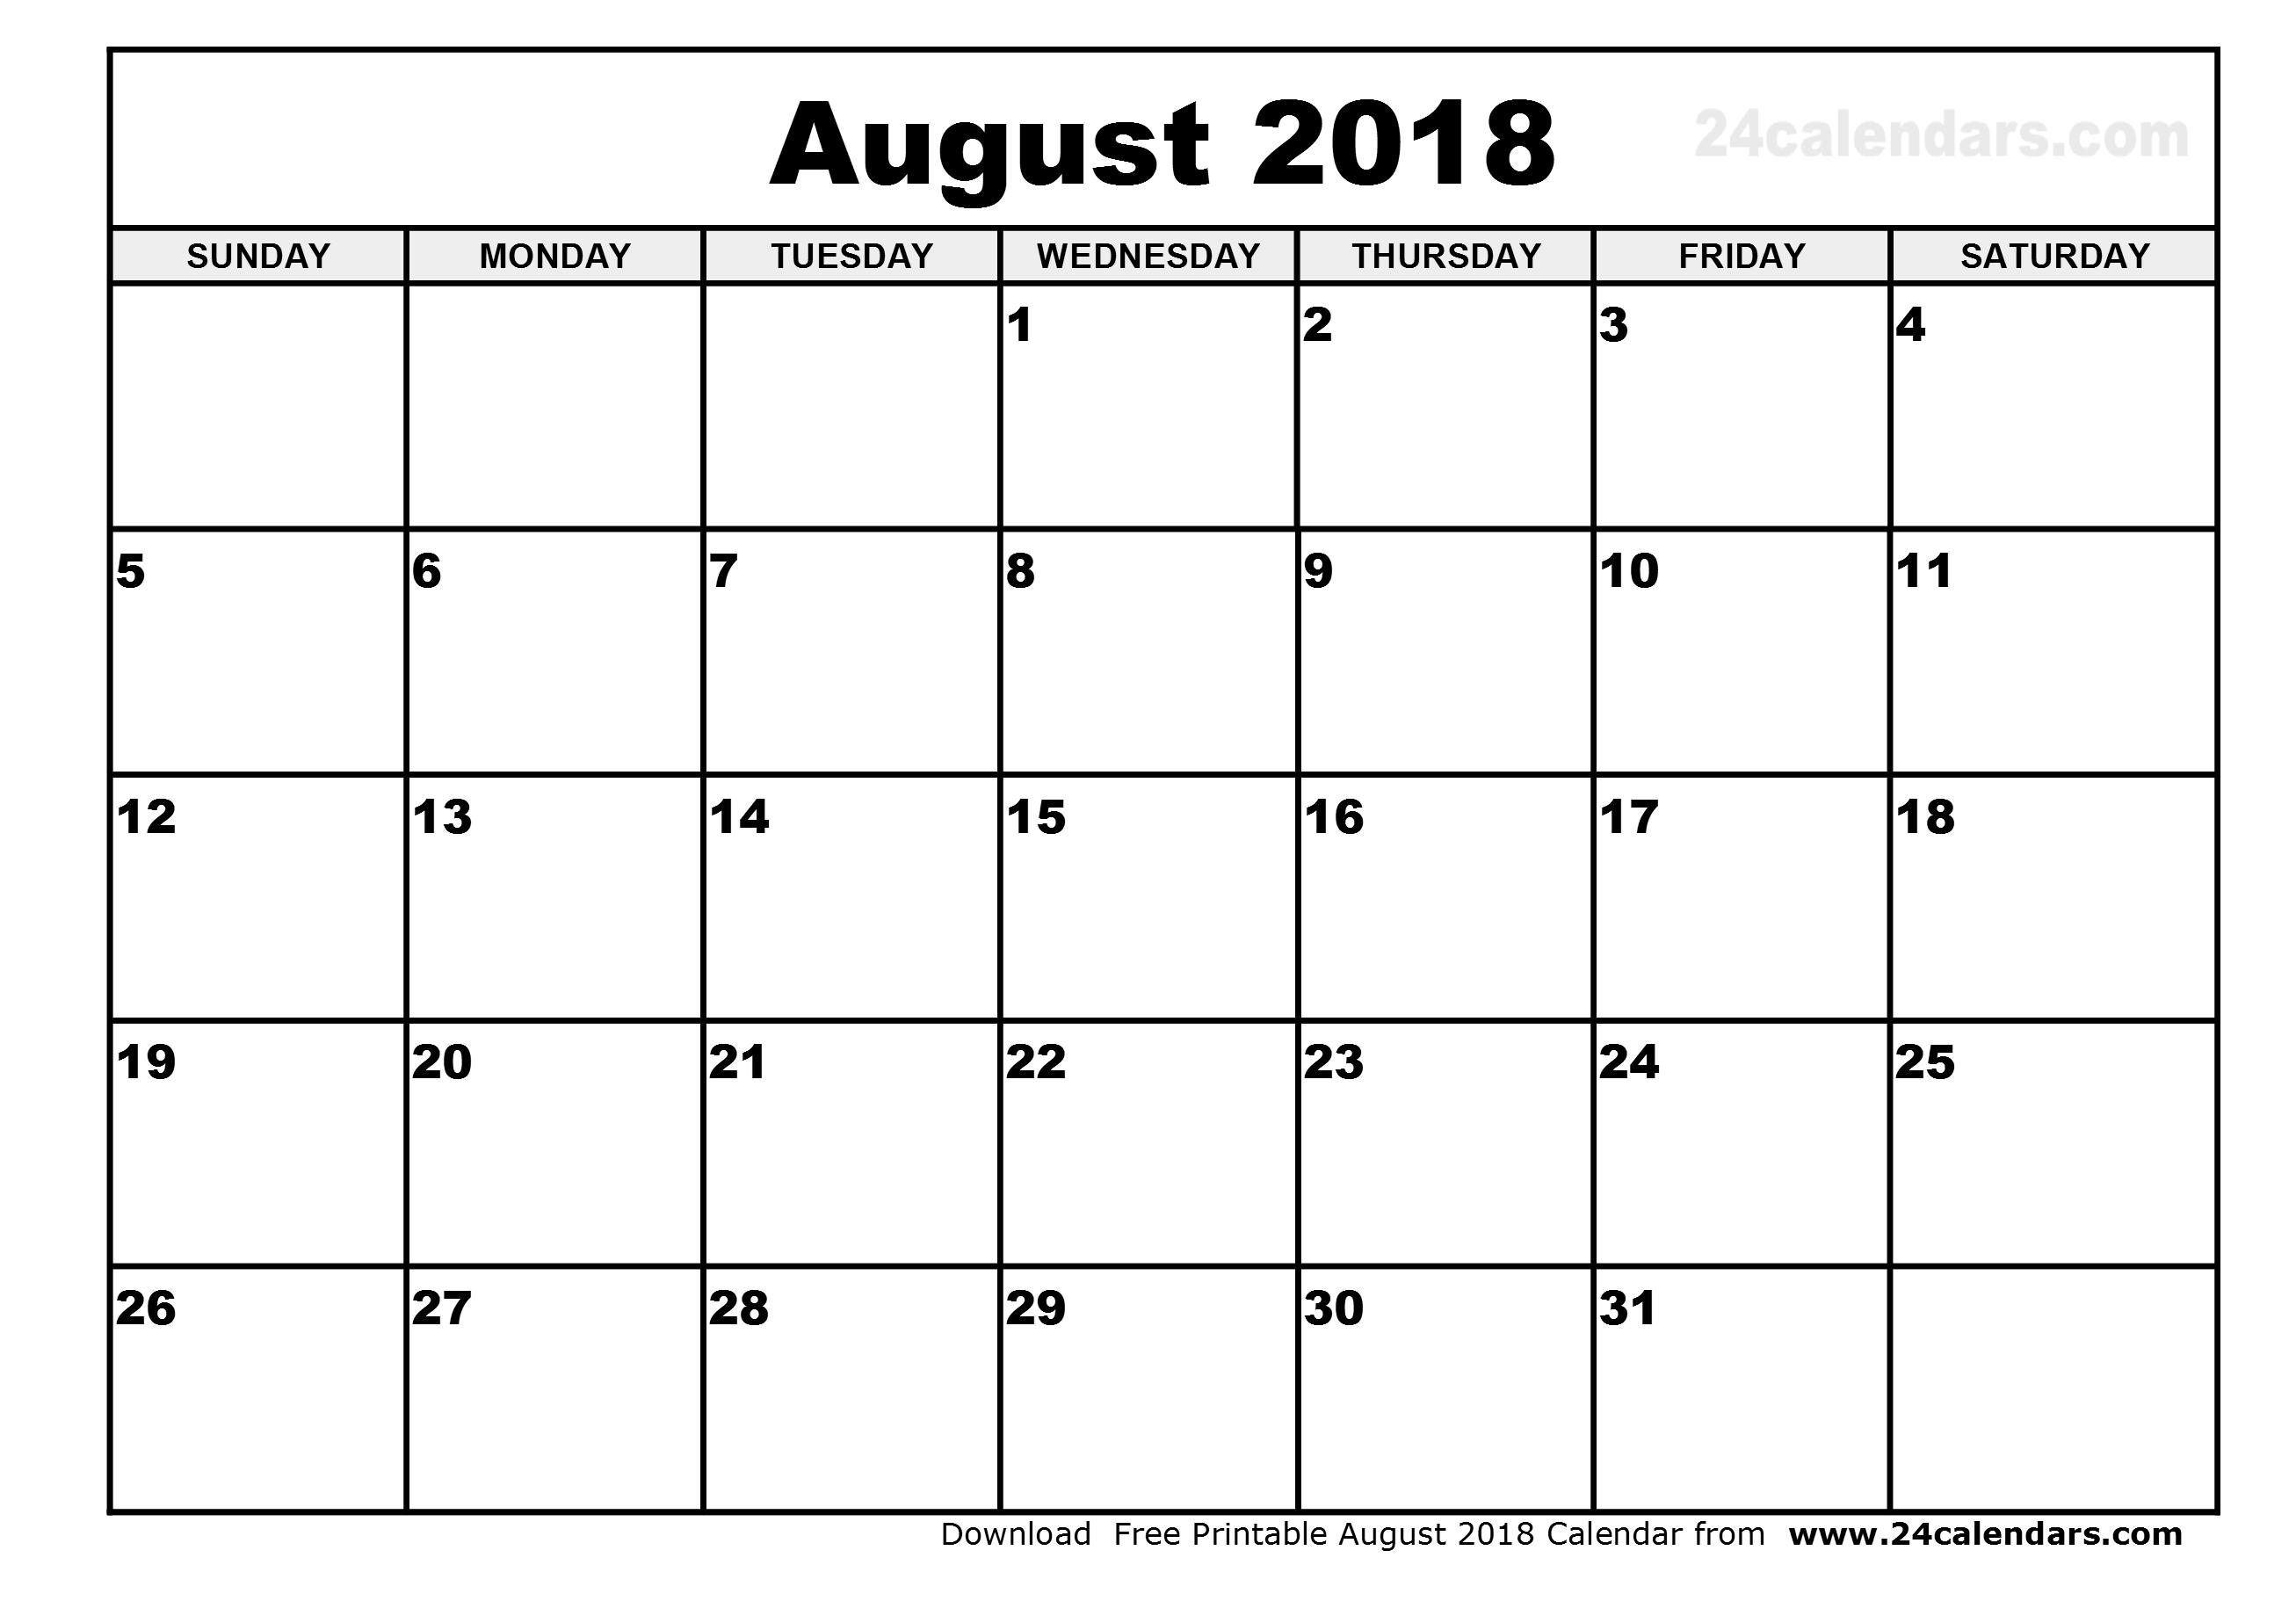 Yearly Calendars Printable